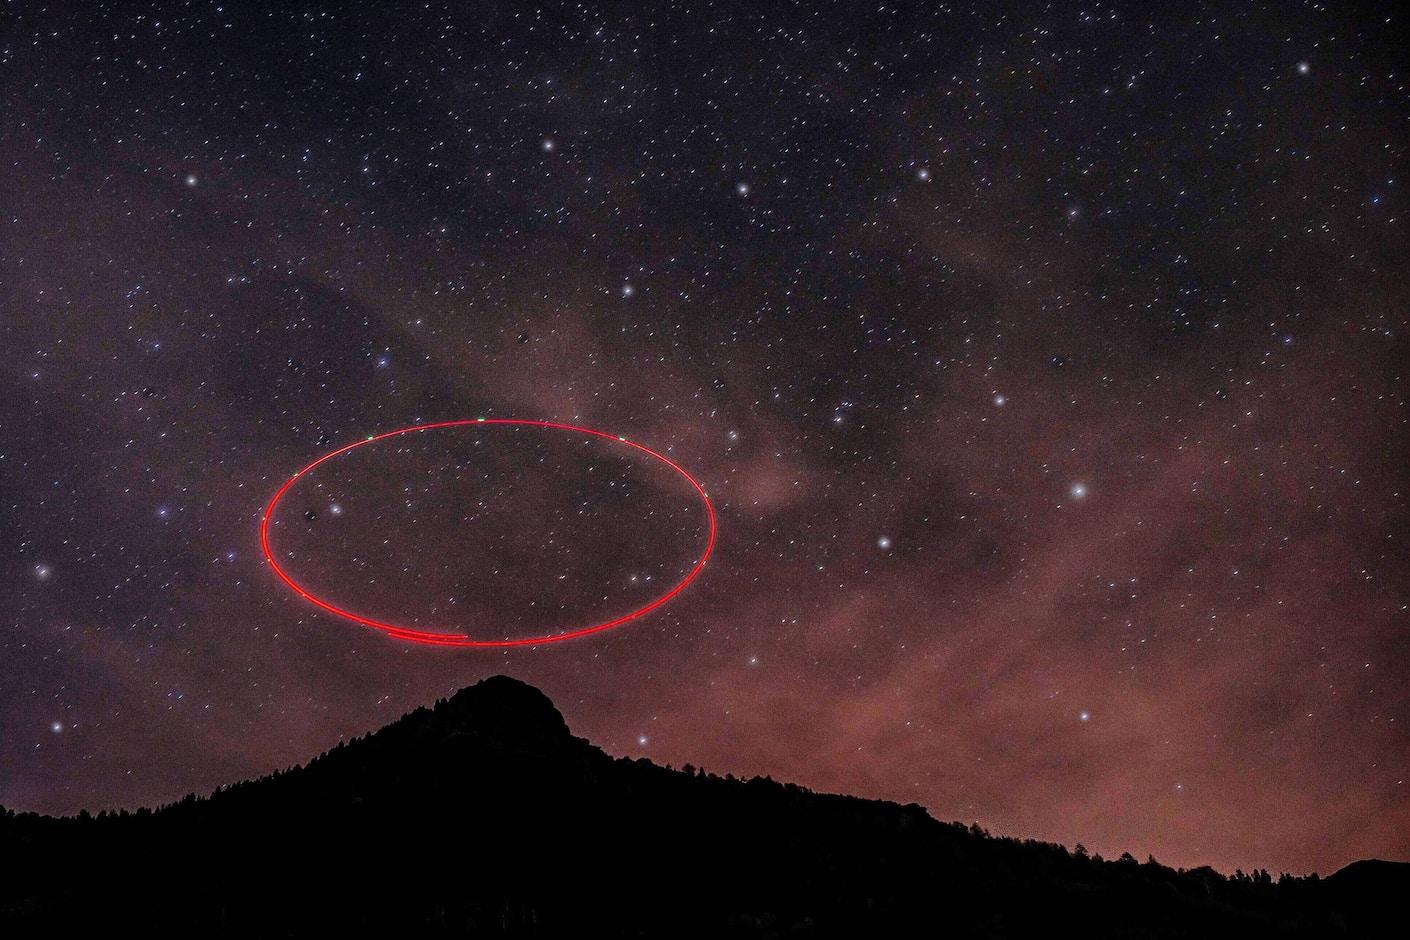 Life on Venus galaxies at night